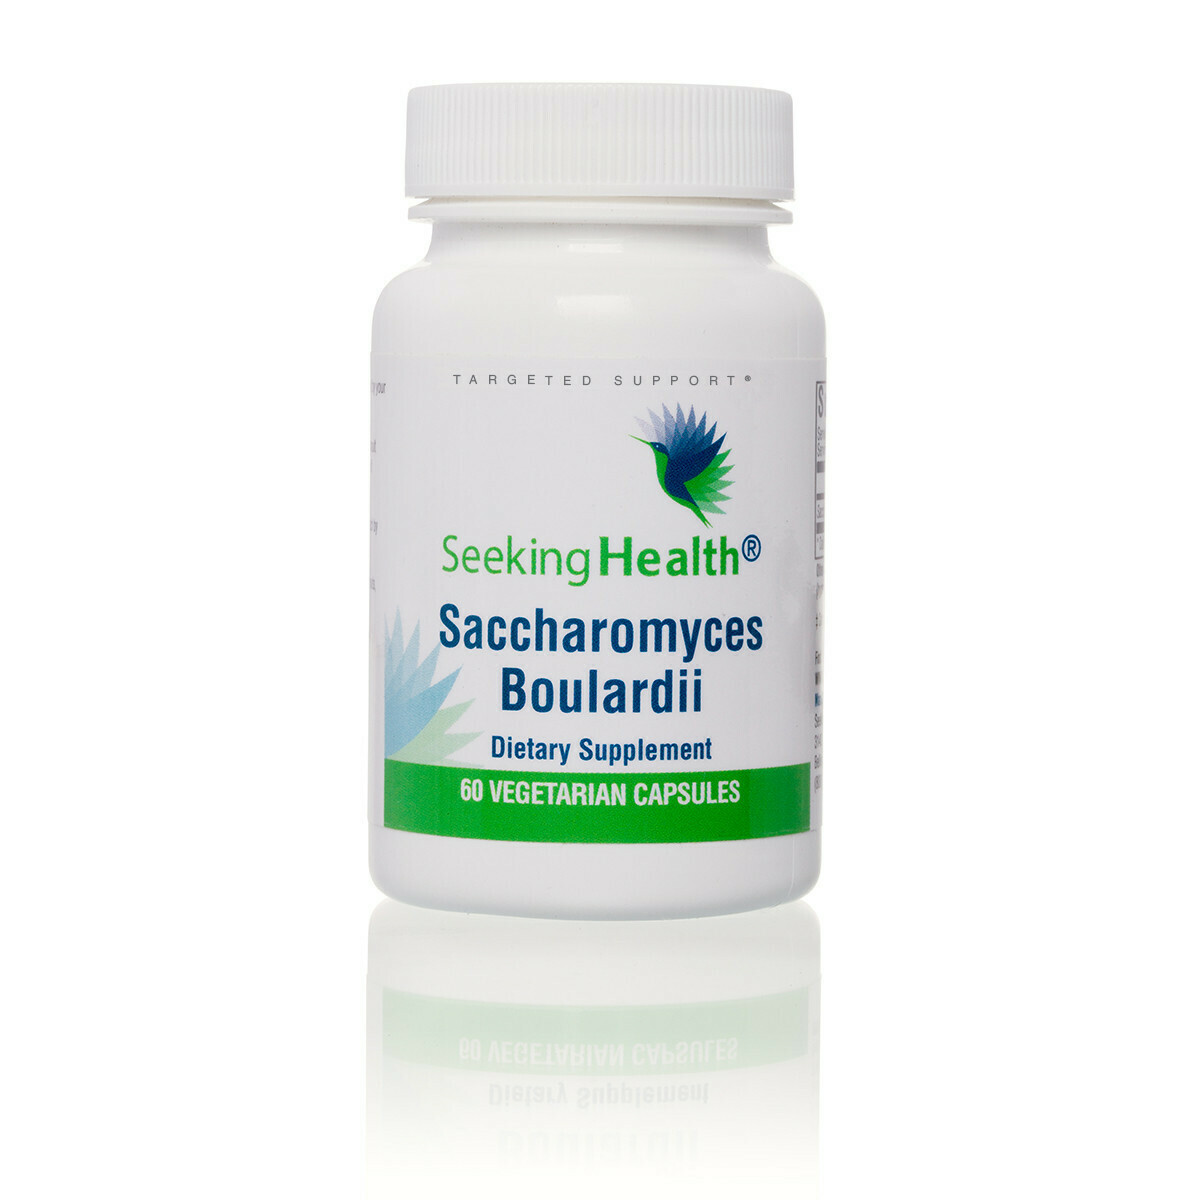 SACCHAROMYCES BOULARDII - 60 CAPSULES  Seeking Health